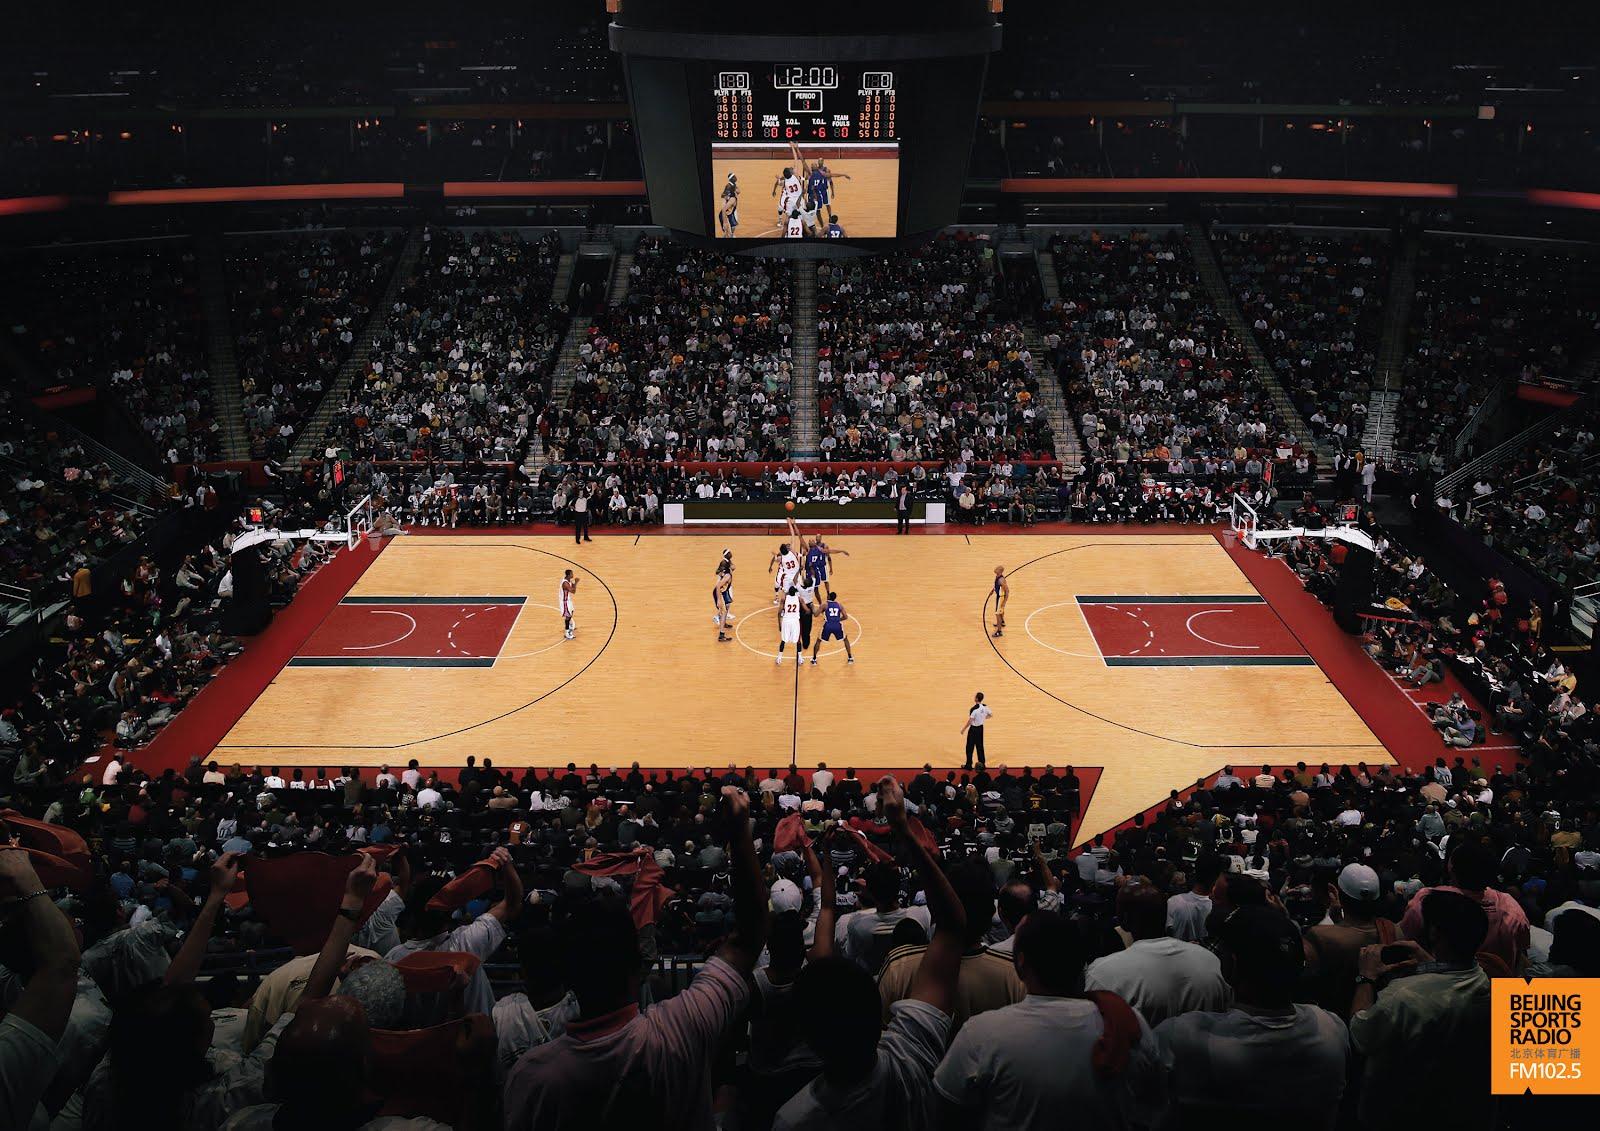 Beijing Sports Radio - basketball